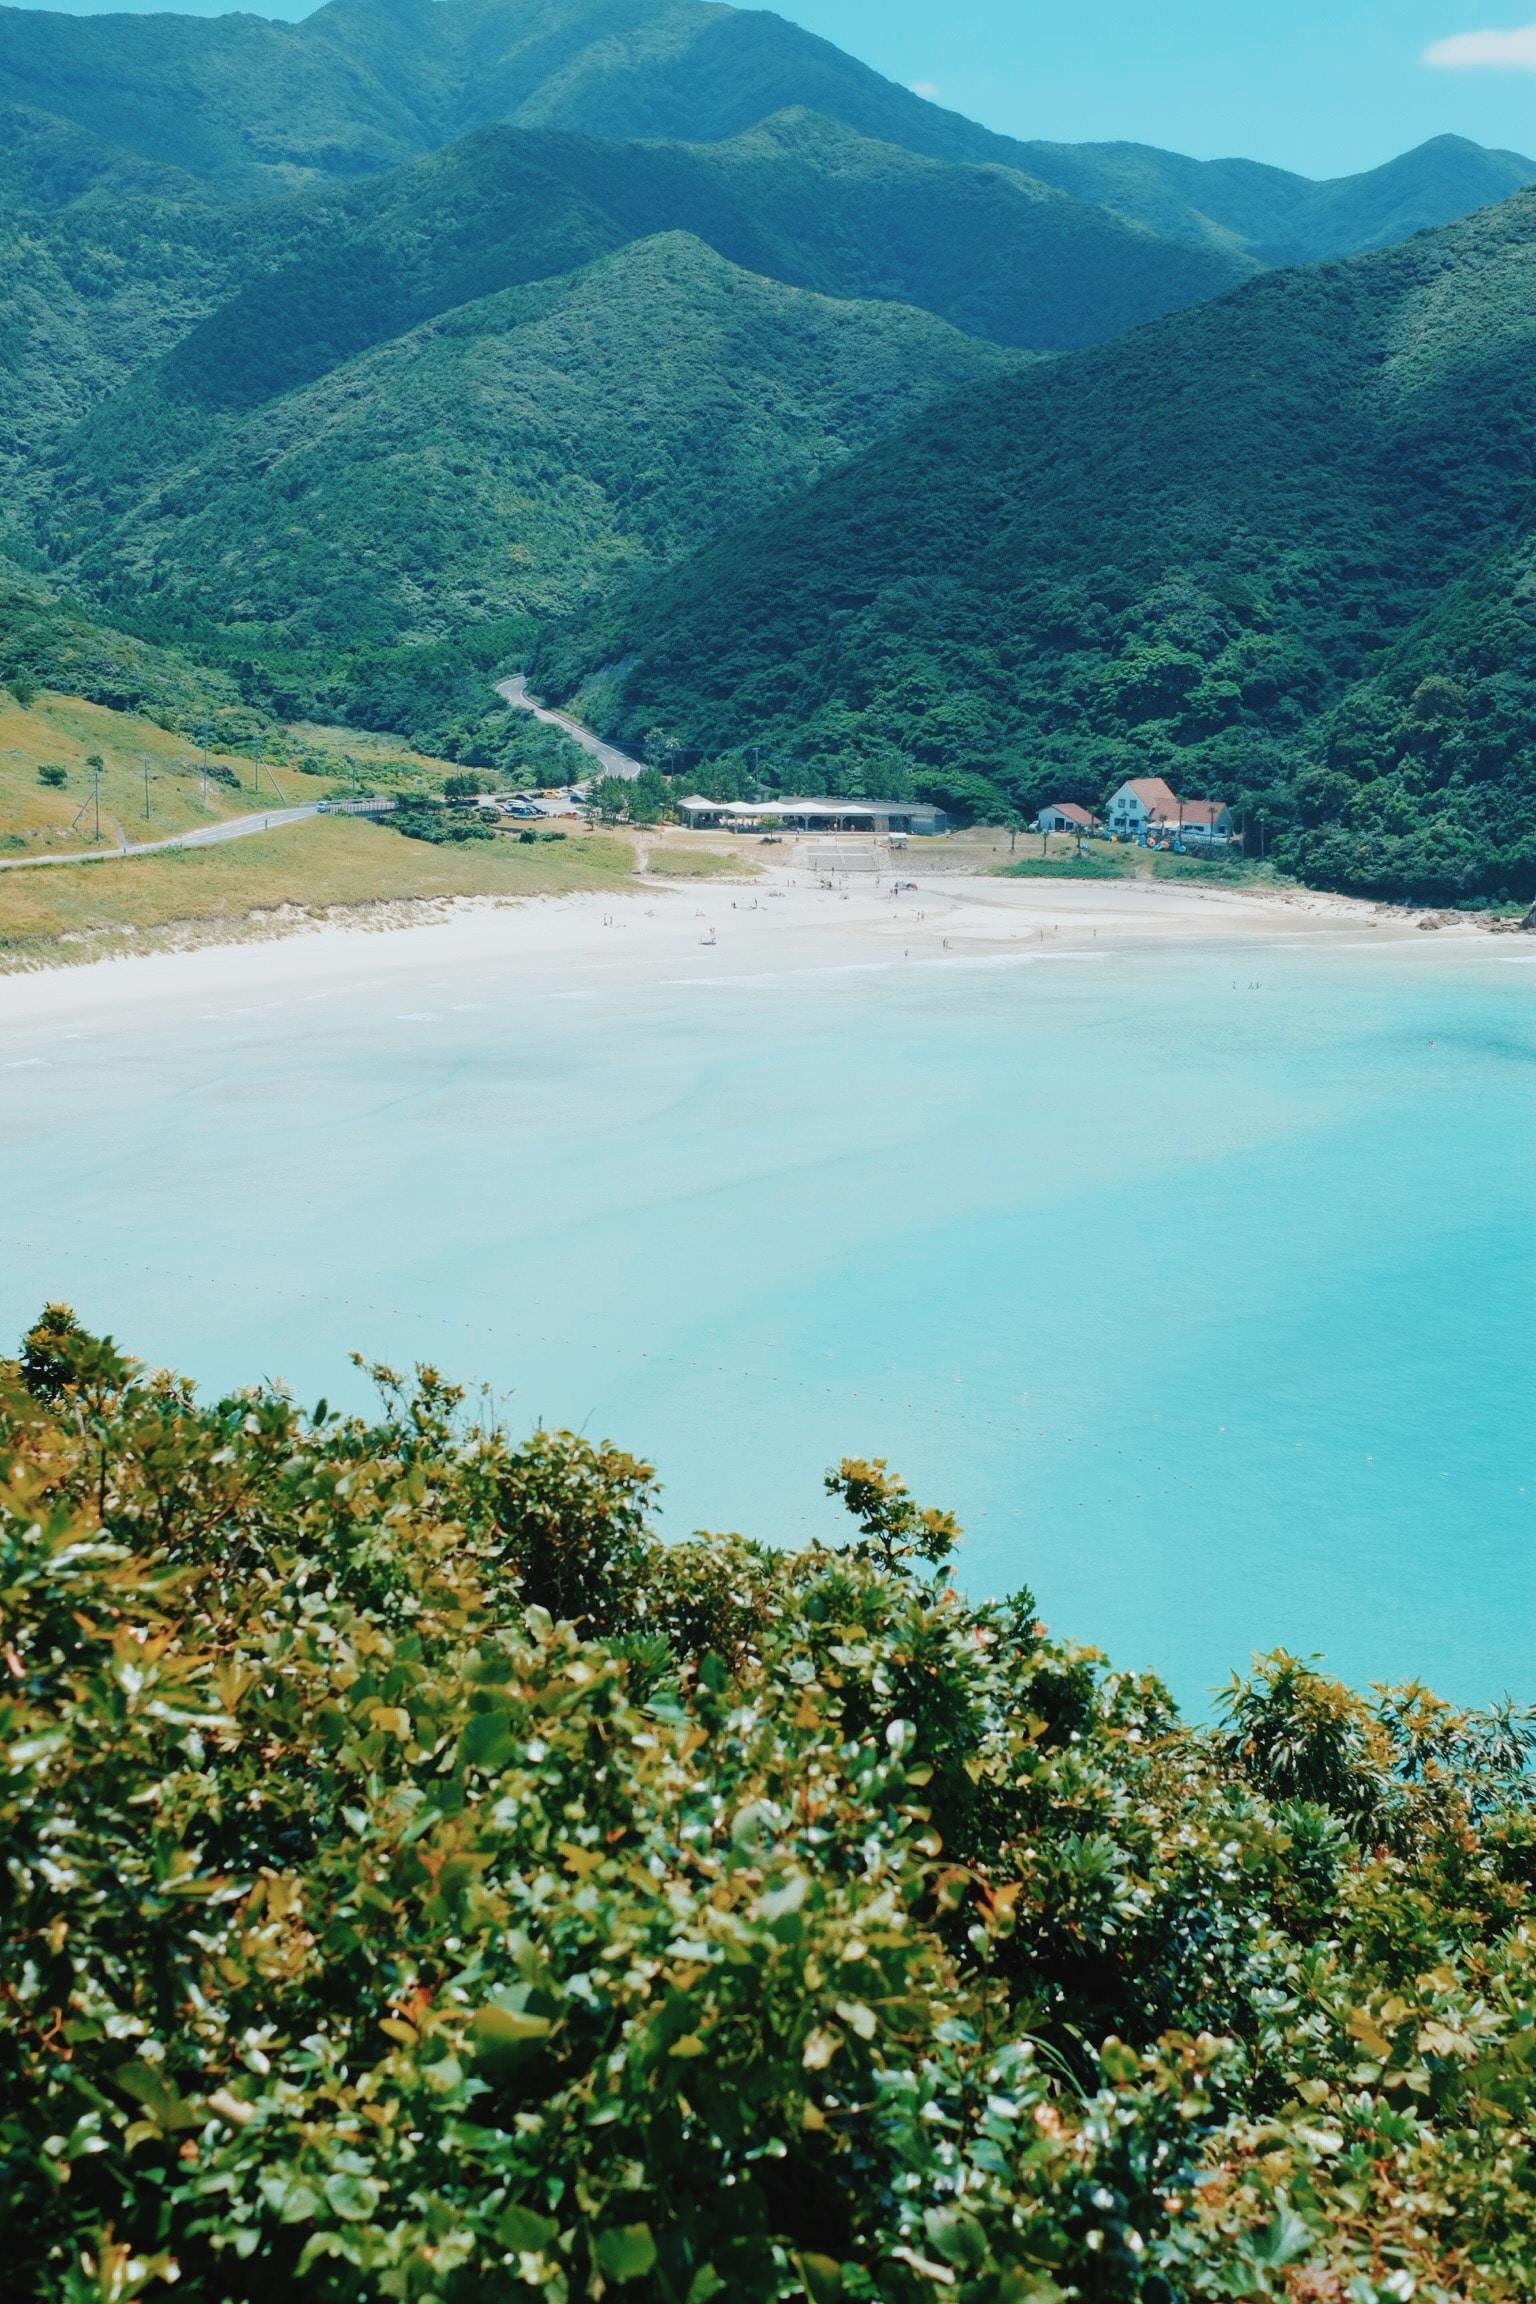 A high shot of a sandy beach in a cove near green hills